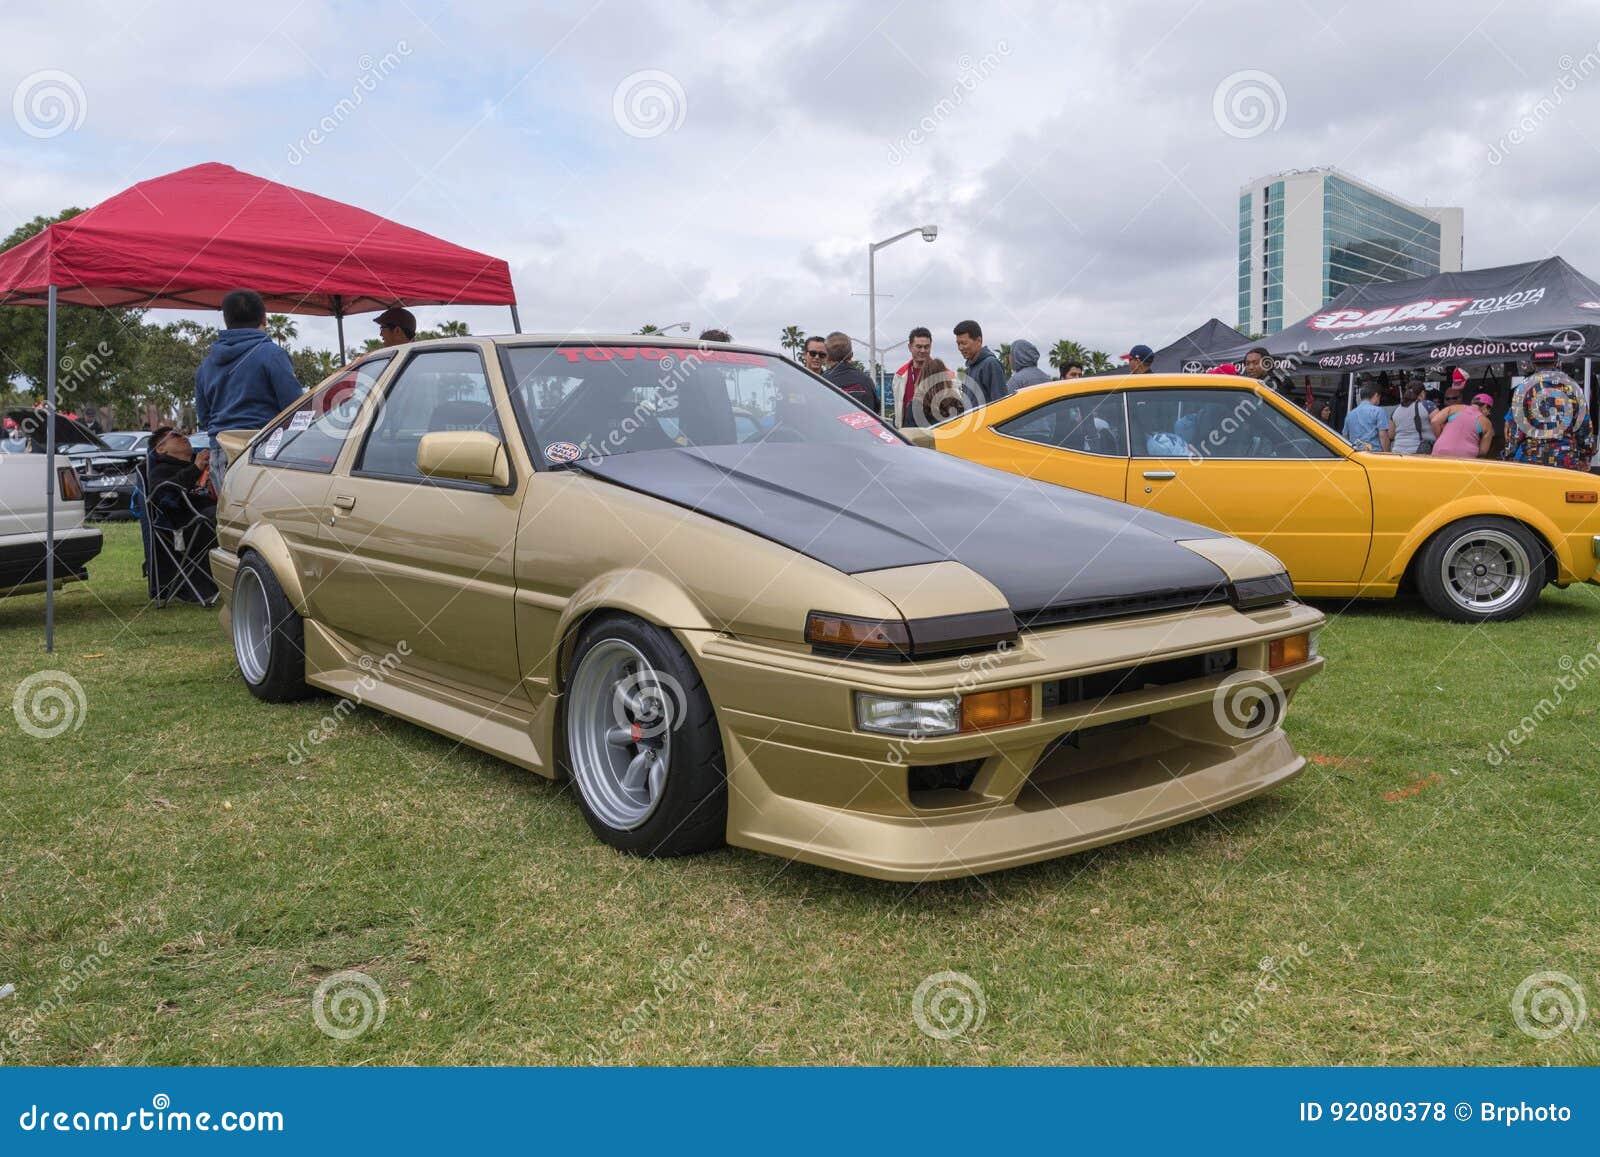 Kekurangan Toyota Corolla 1986 Perbandingan Harga